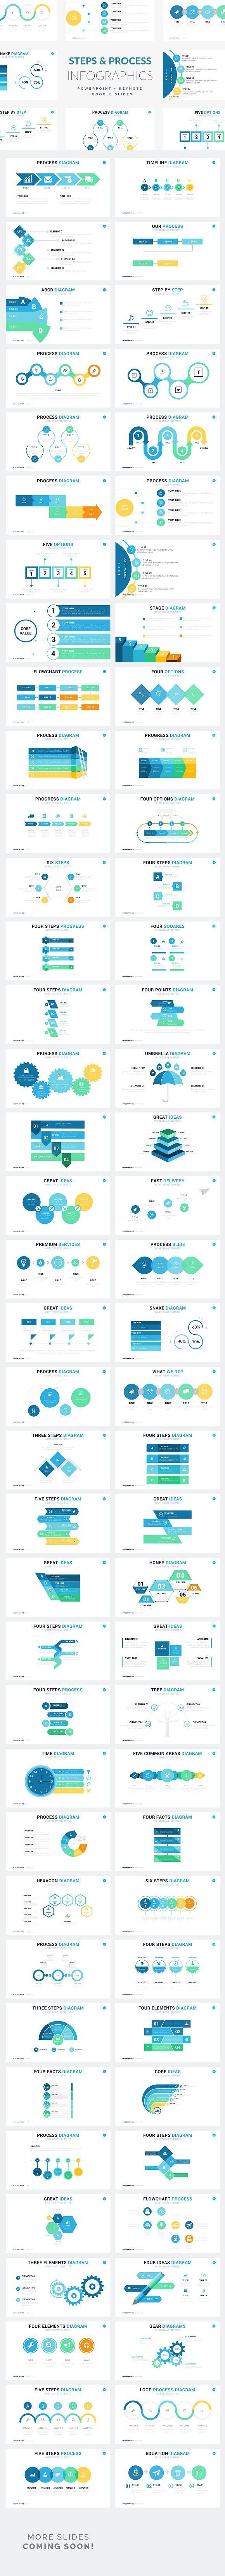 Steps Process Infographics | PPT KEY. Presentation Templates #InfographicsProcess